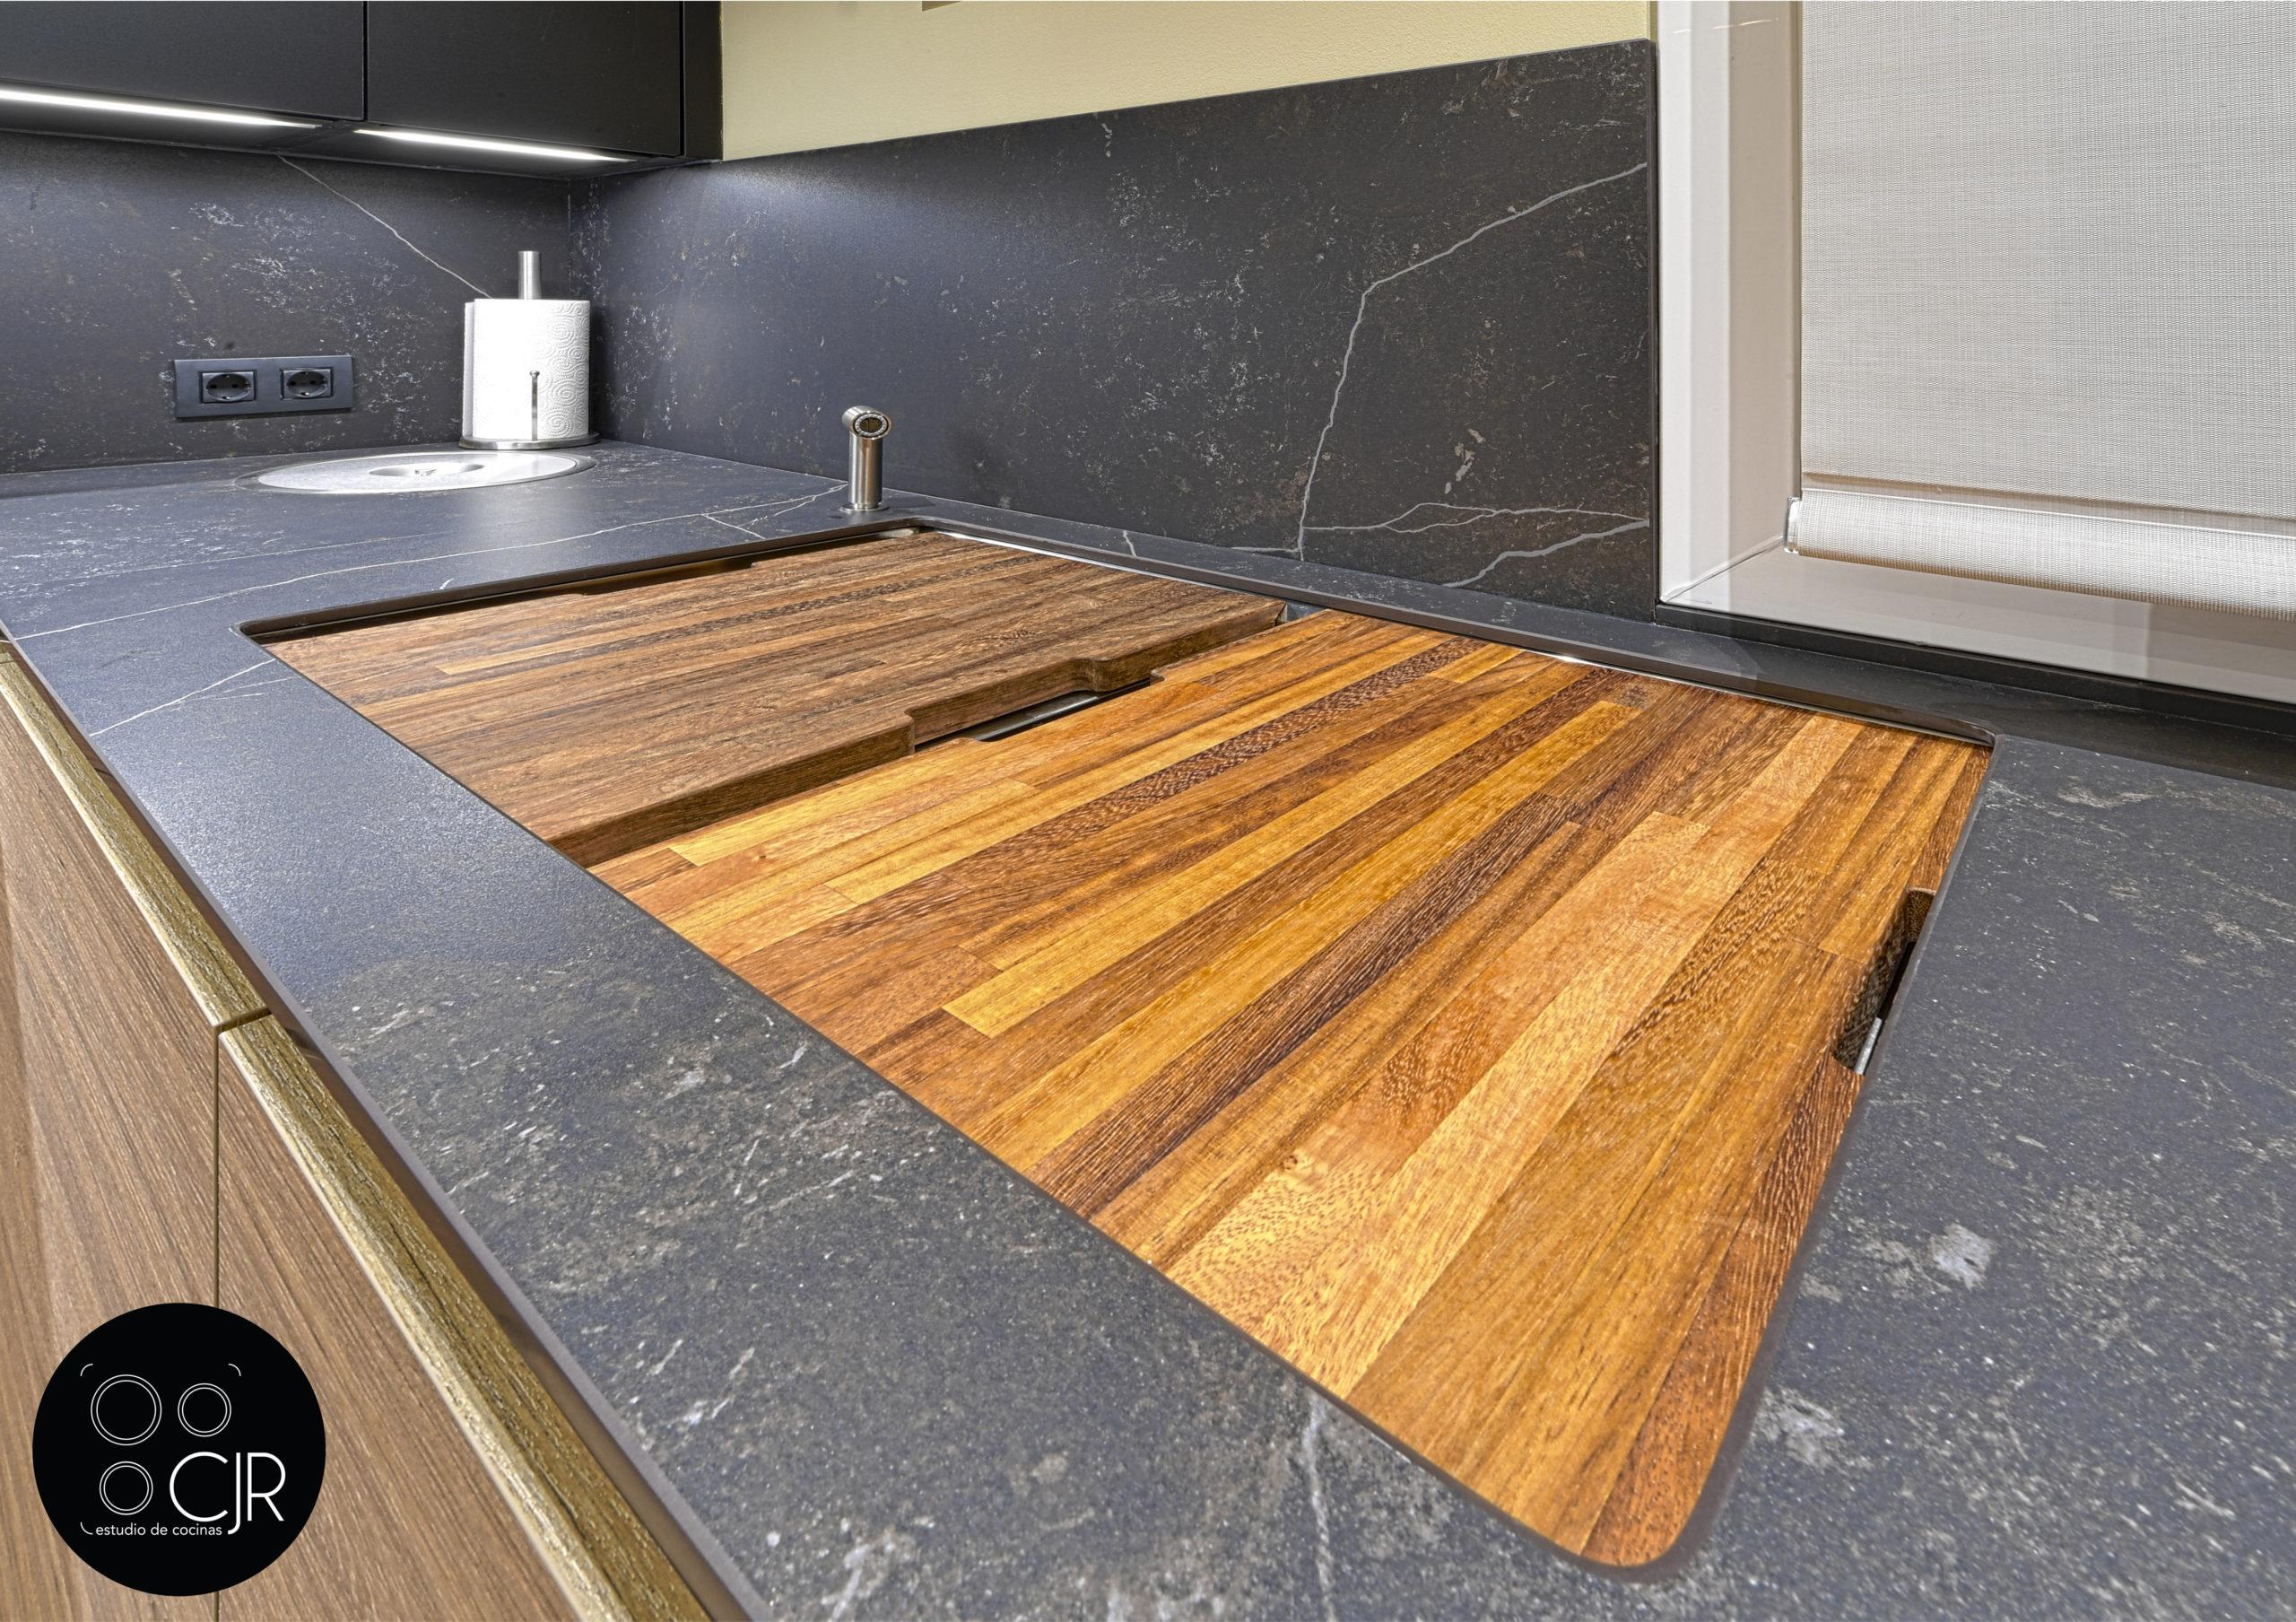 Fregadero de cocina moderna negra y madera